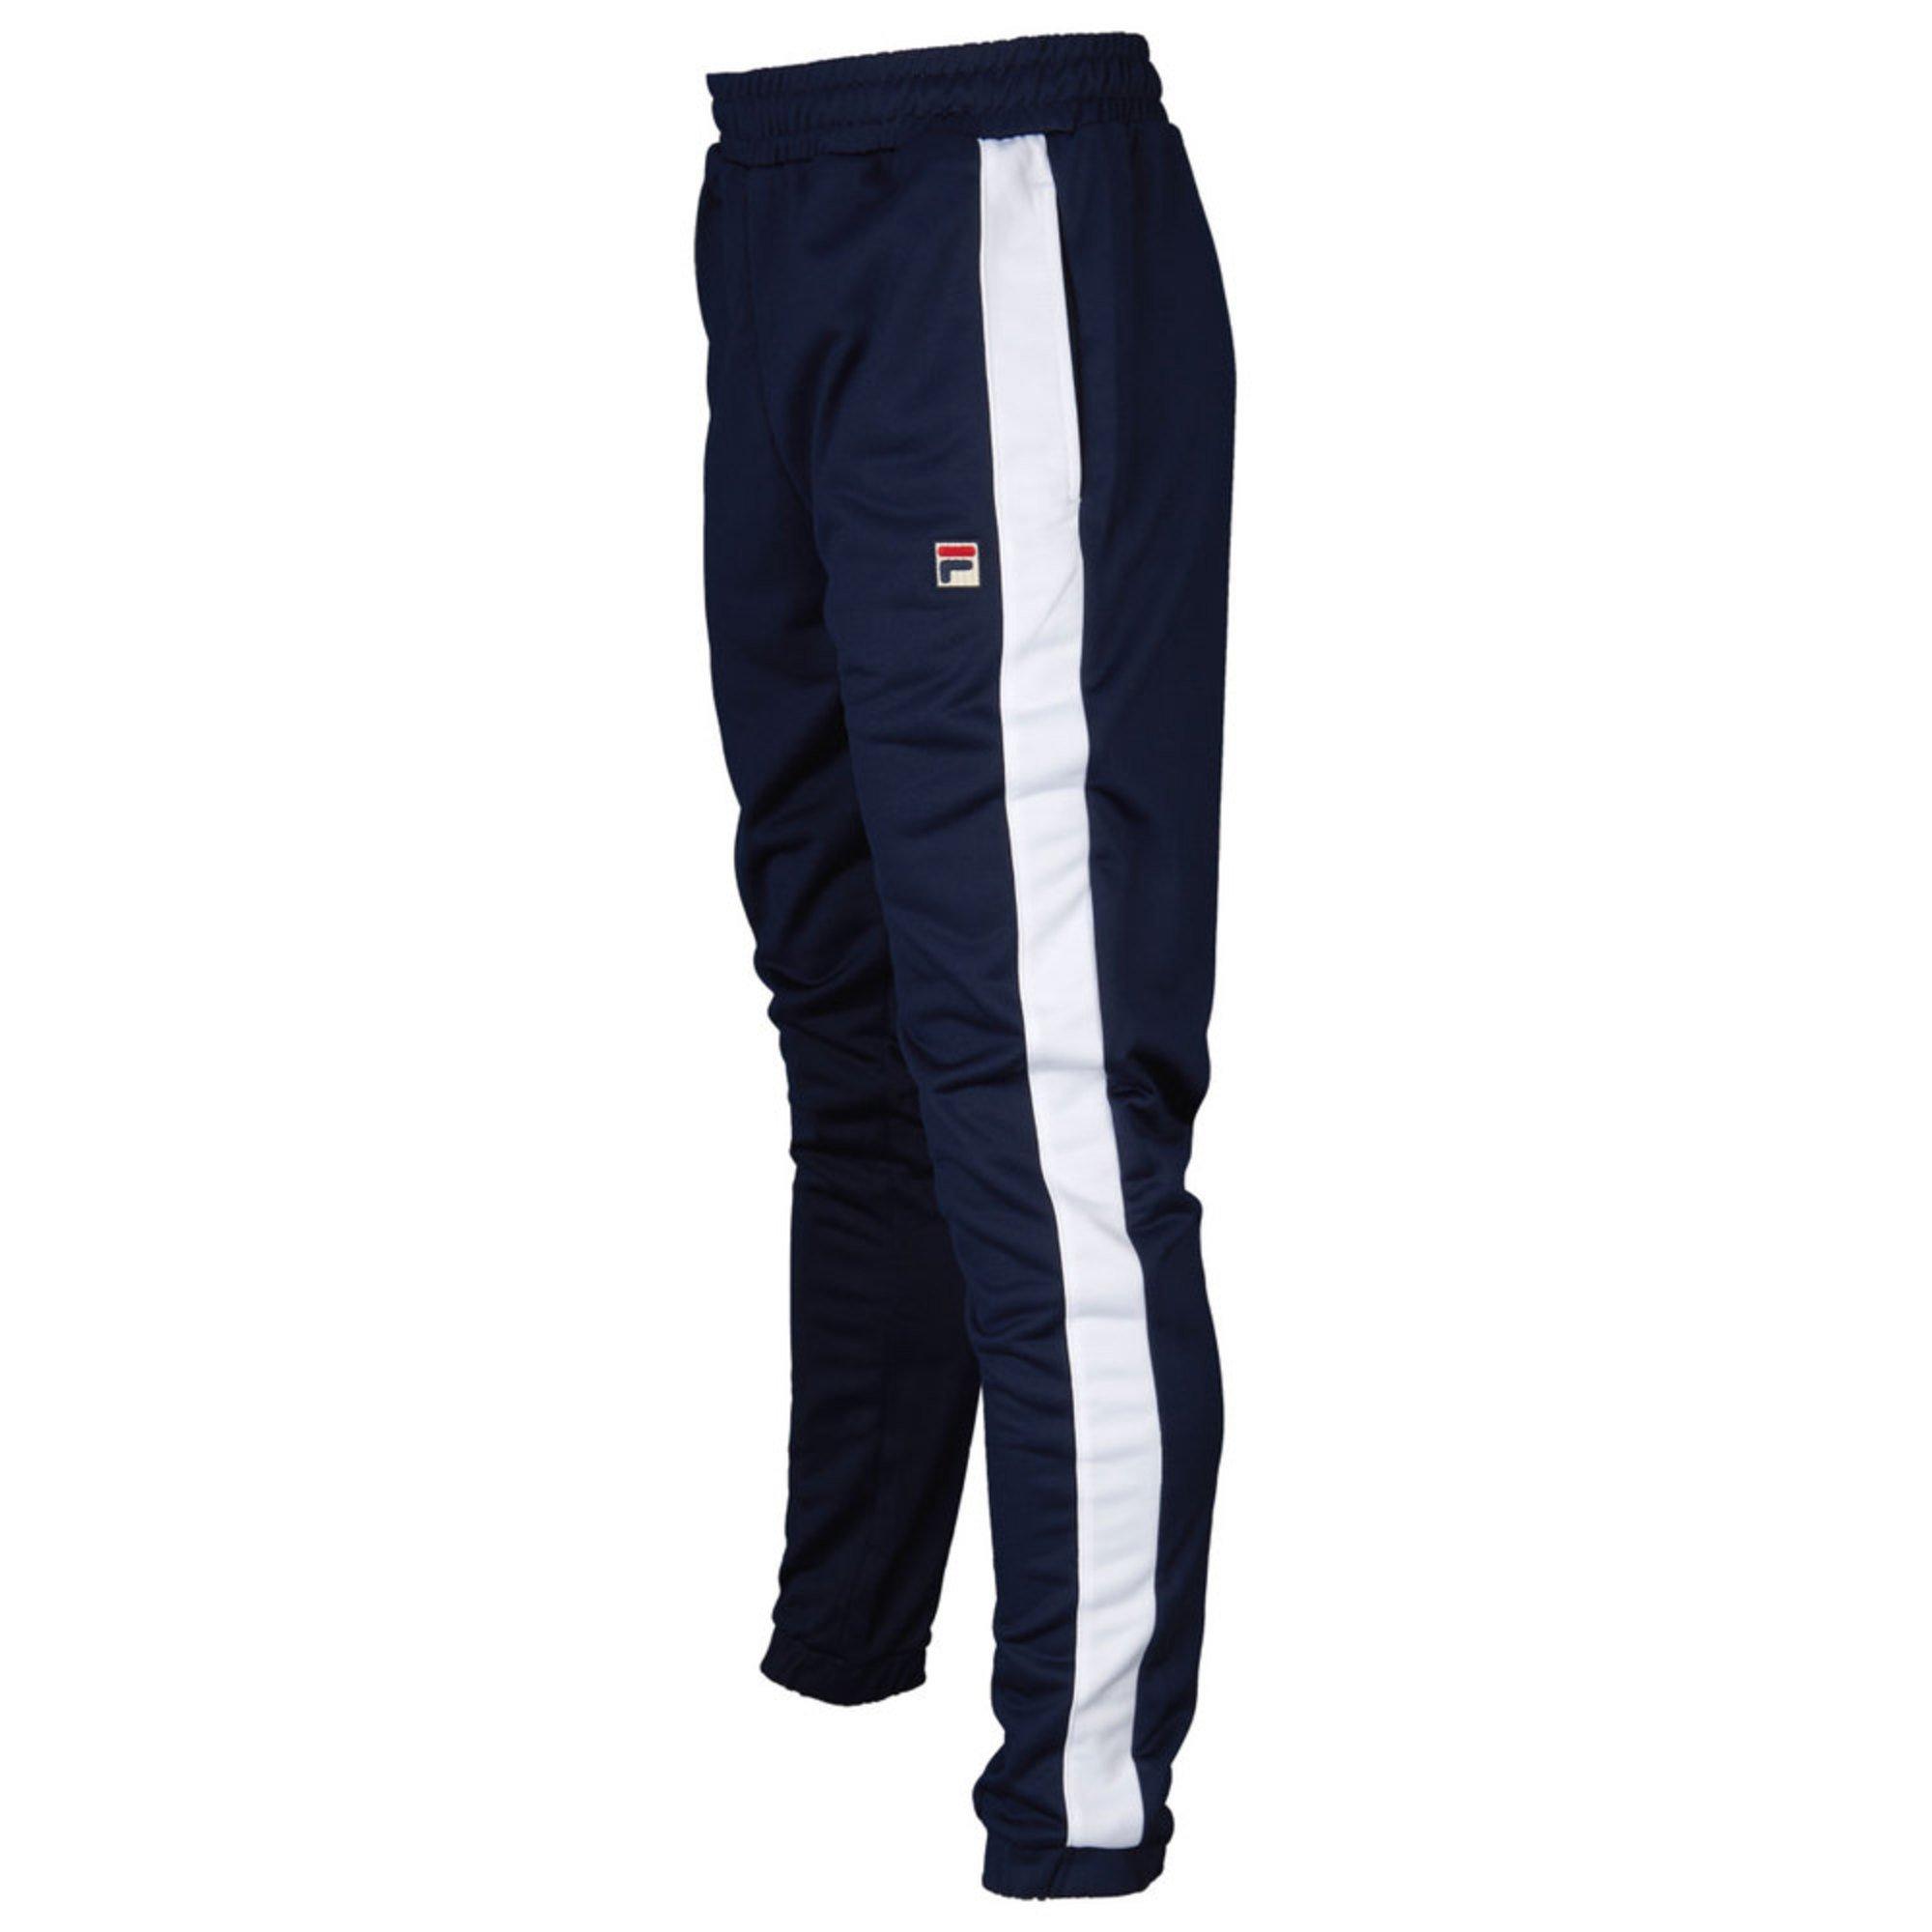 bba457b6 Fila Men's Heritage Renzo Track Pants   Activewear Pants   Apparel ...